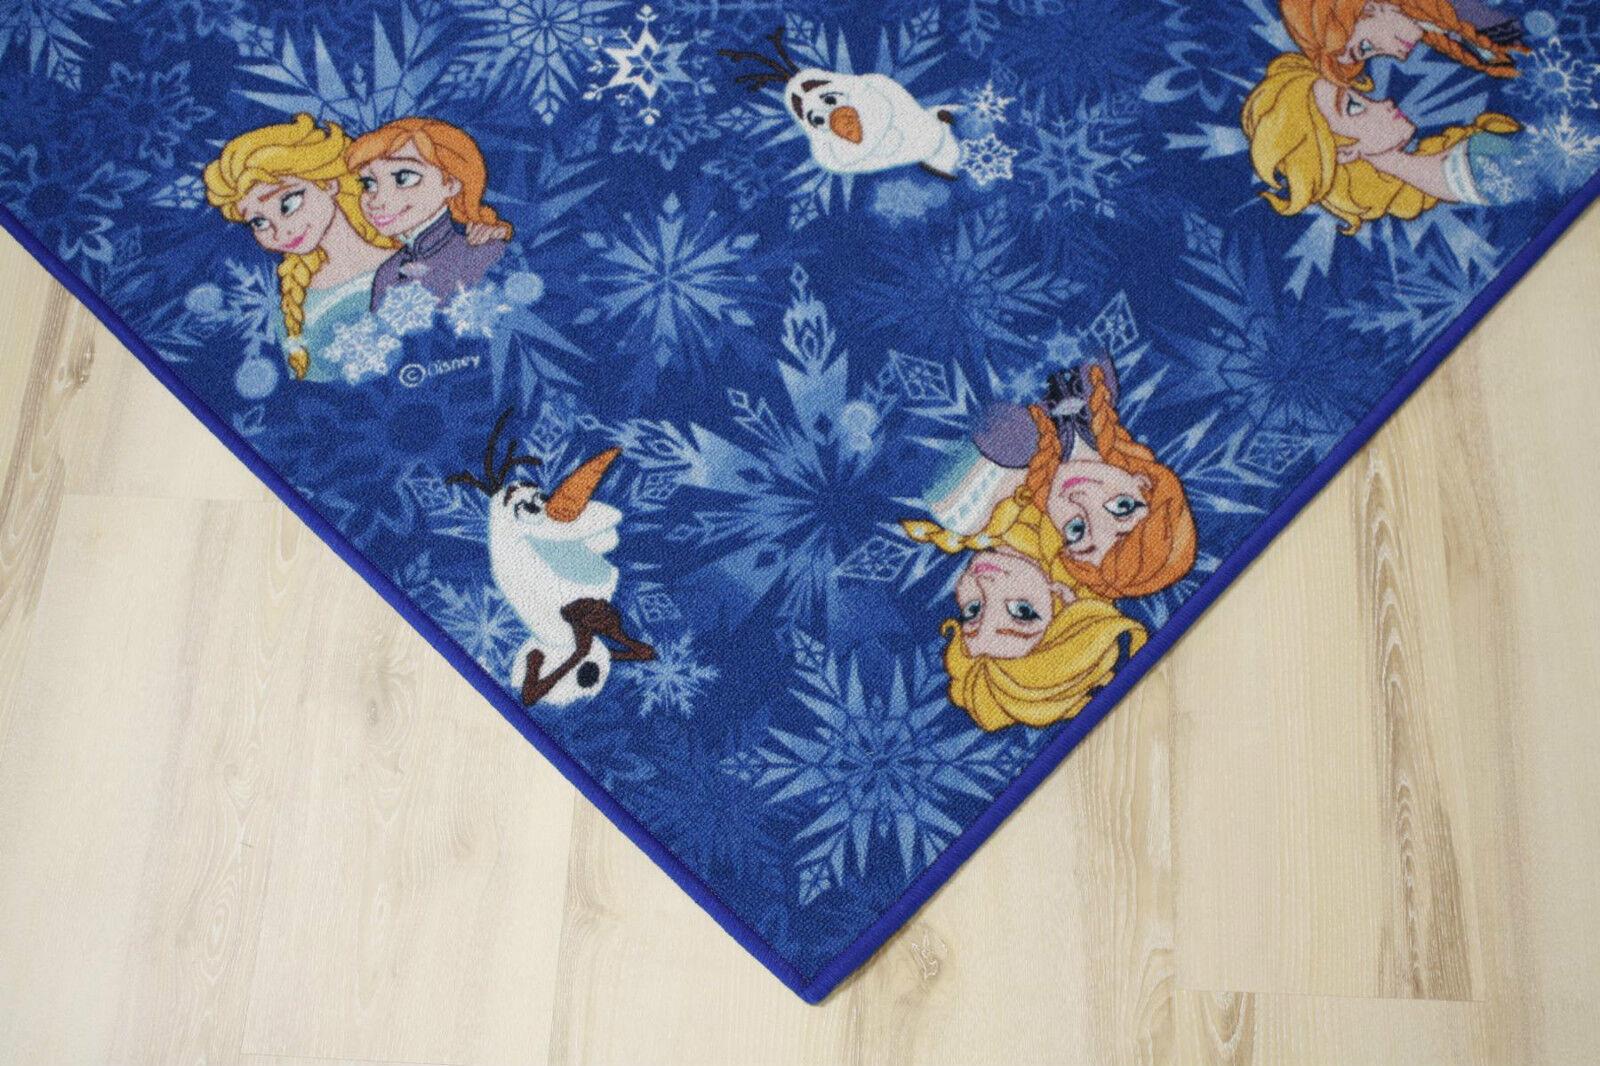 Enfants Tapis Jeu Tapis Reine Frozen Bleu 400x490 cm Elsa Anna Olaf